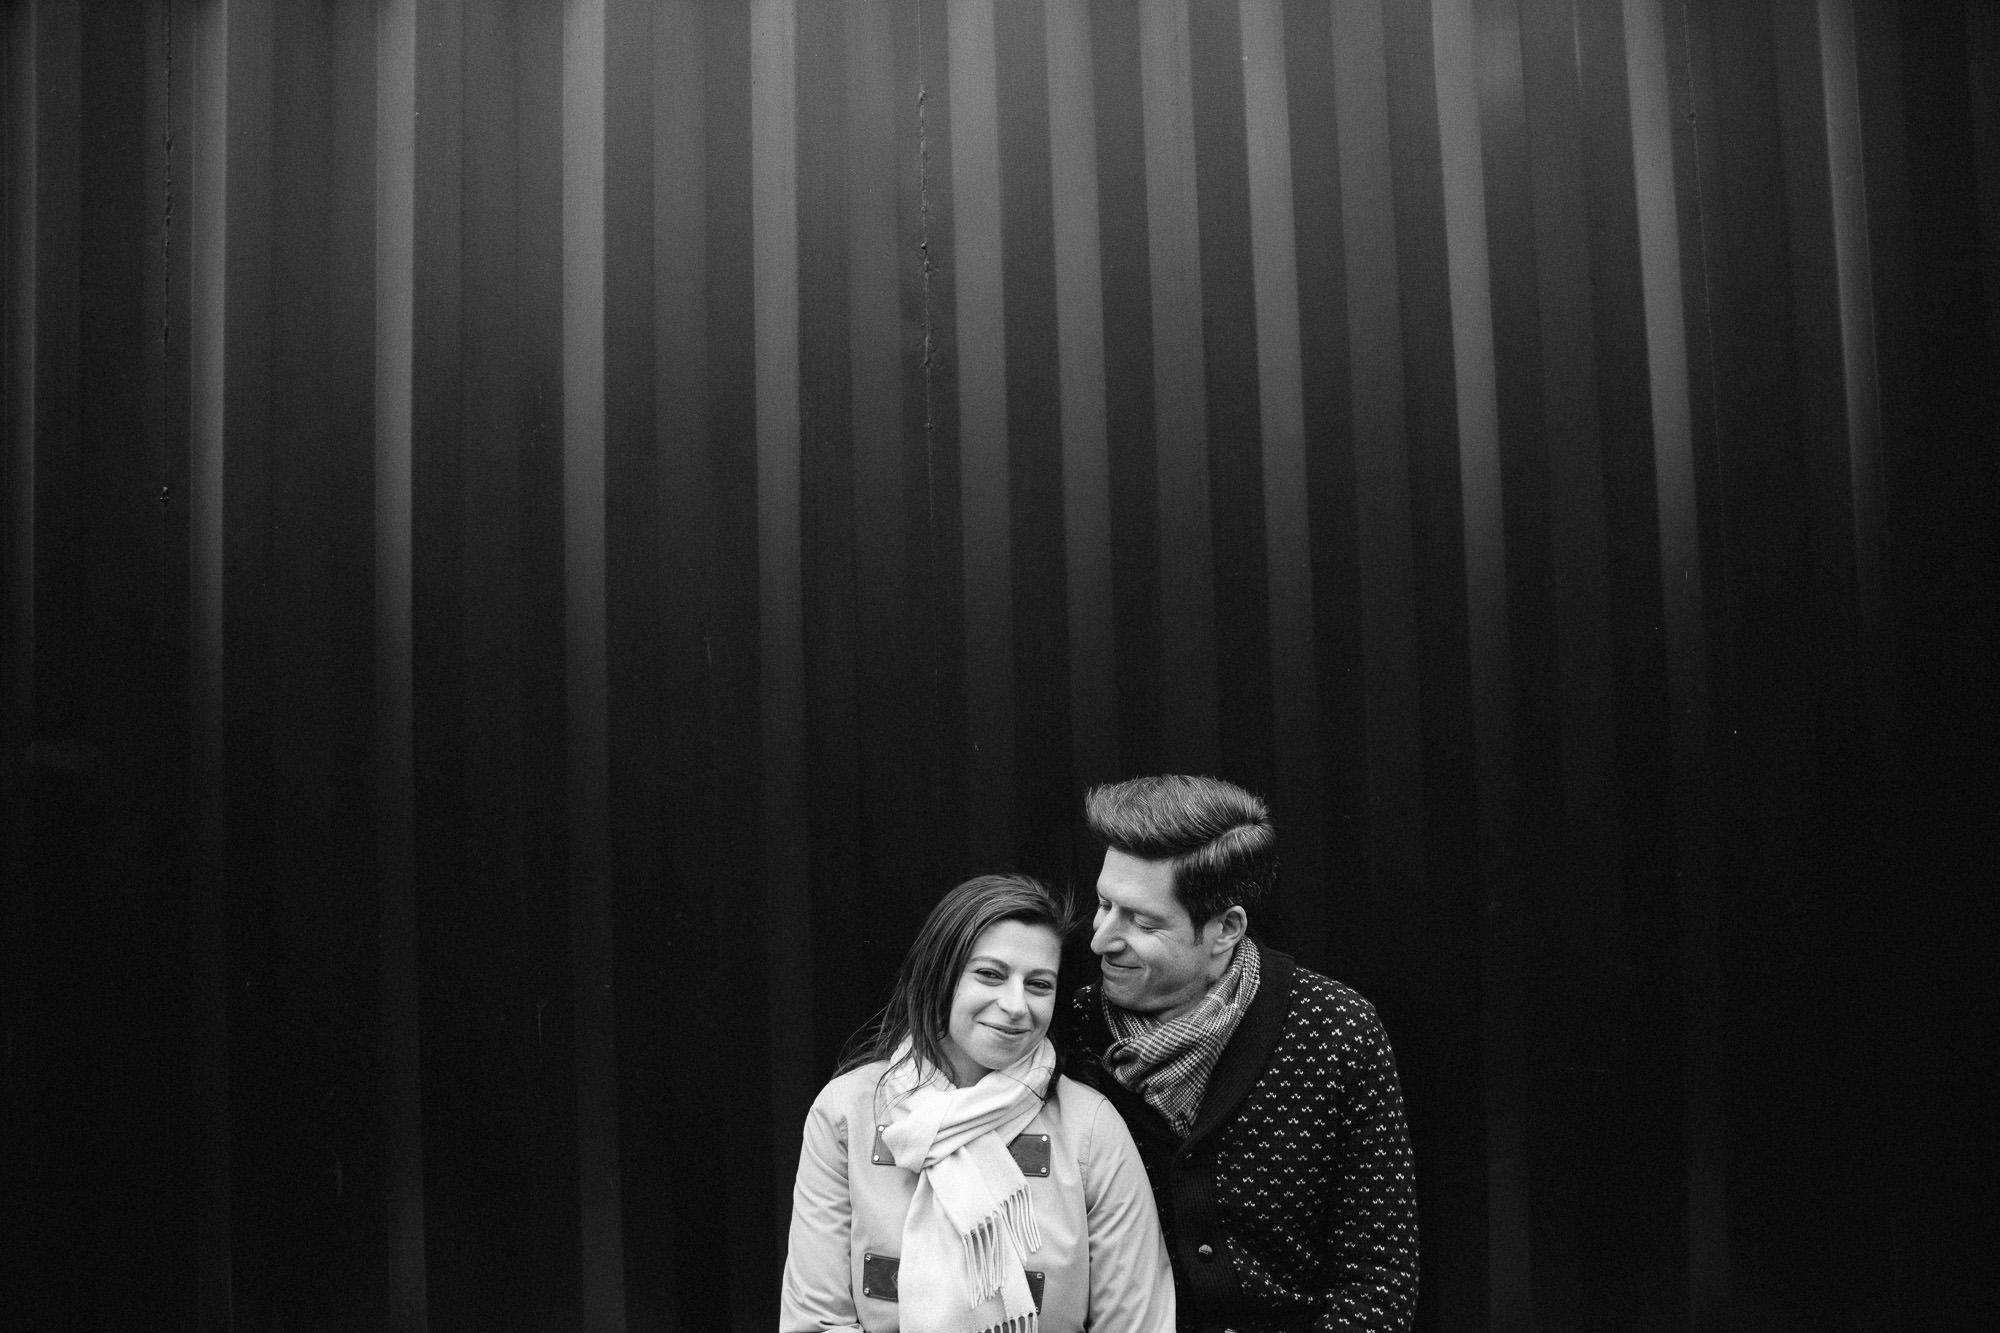 CLAIREBYRNEPHOTOGRAPHY-WEDDING-London-engagment-shoreditch-cute-fun-14.jpg